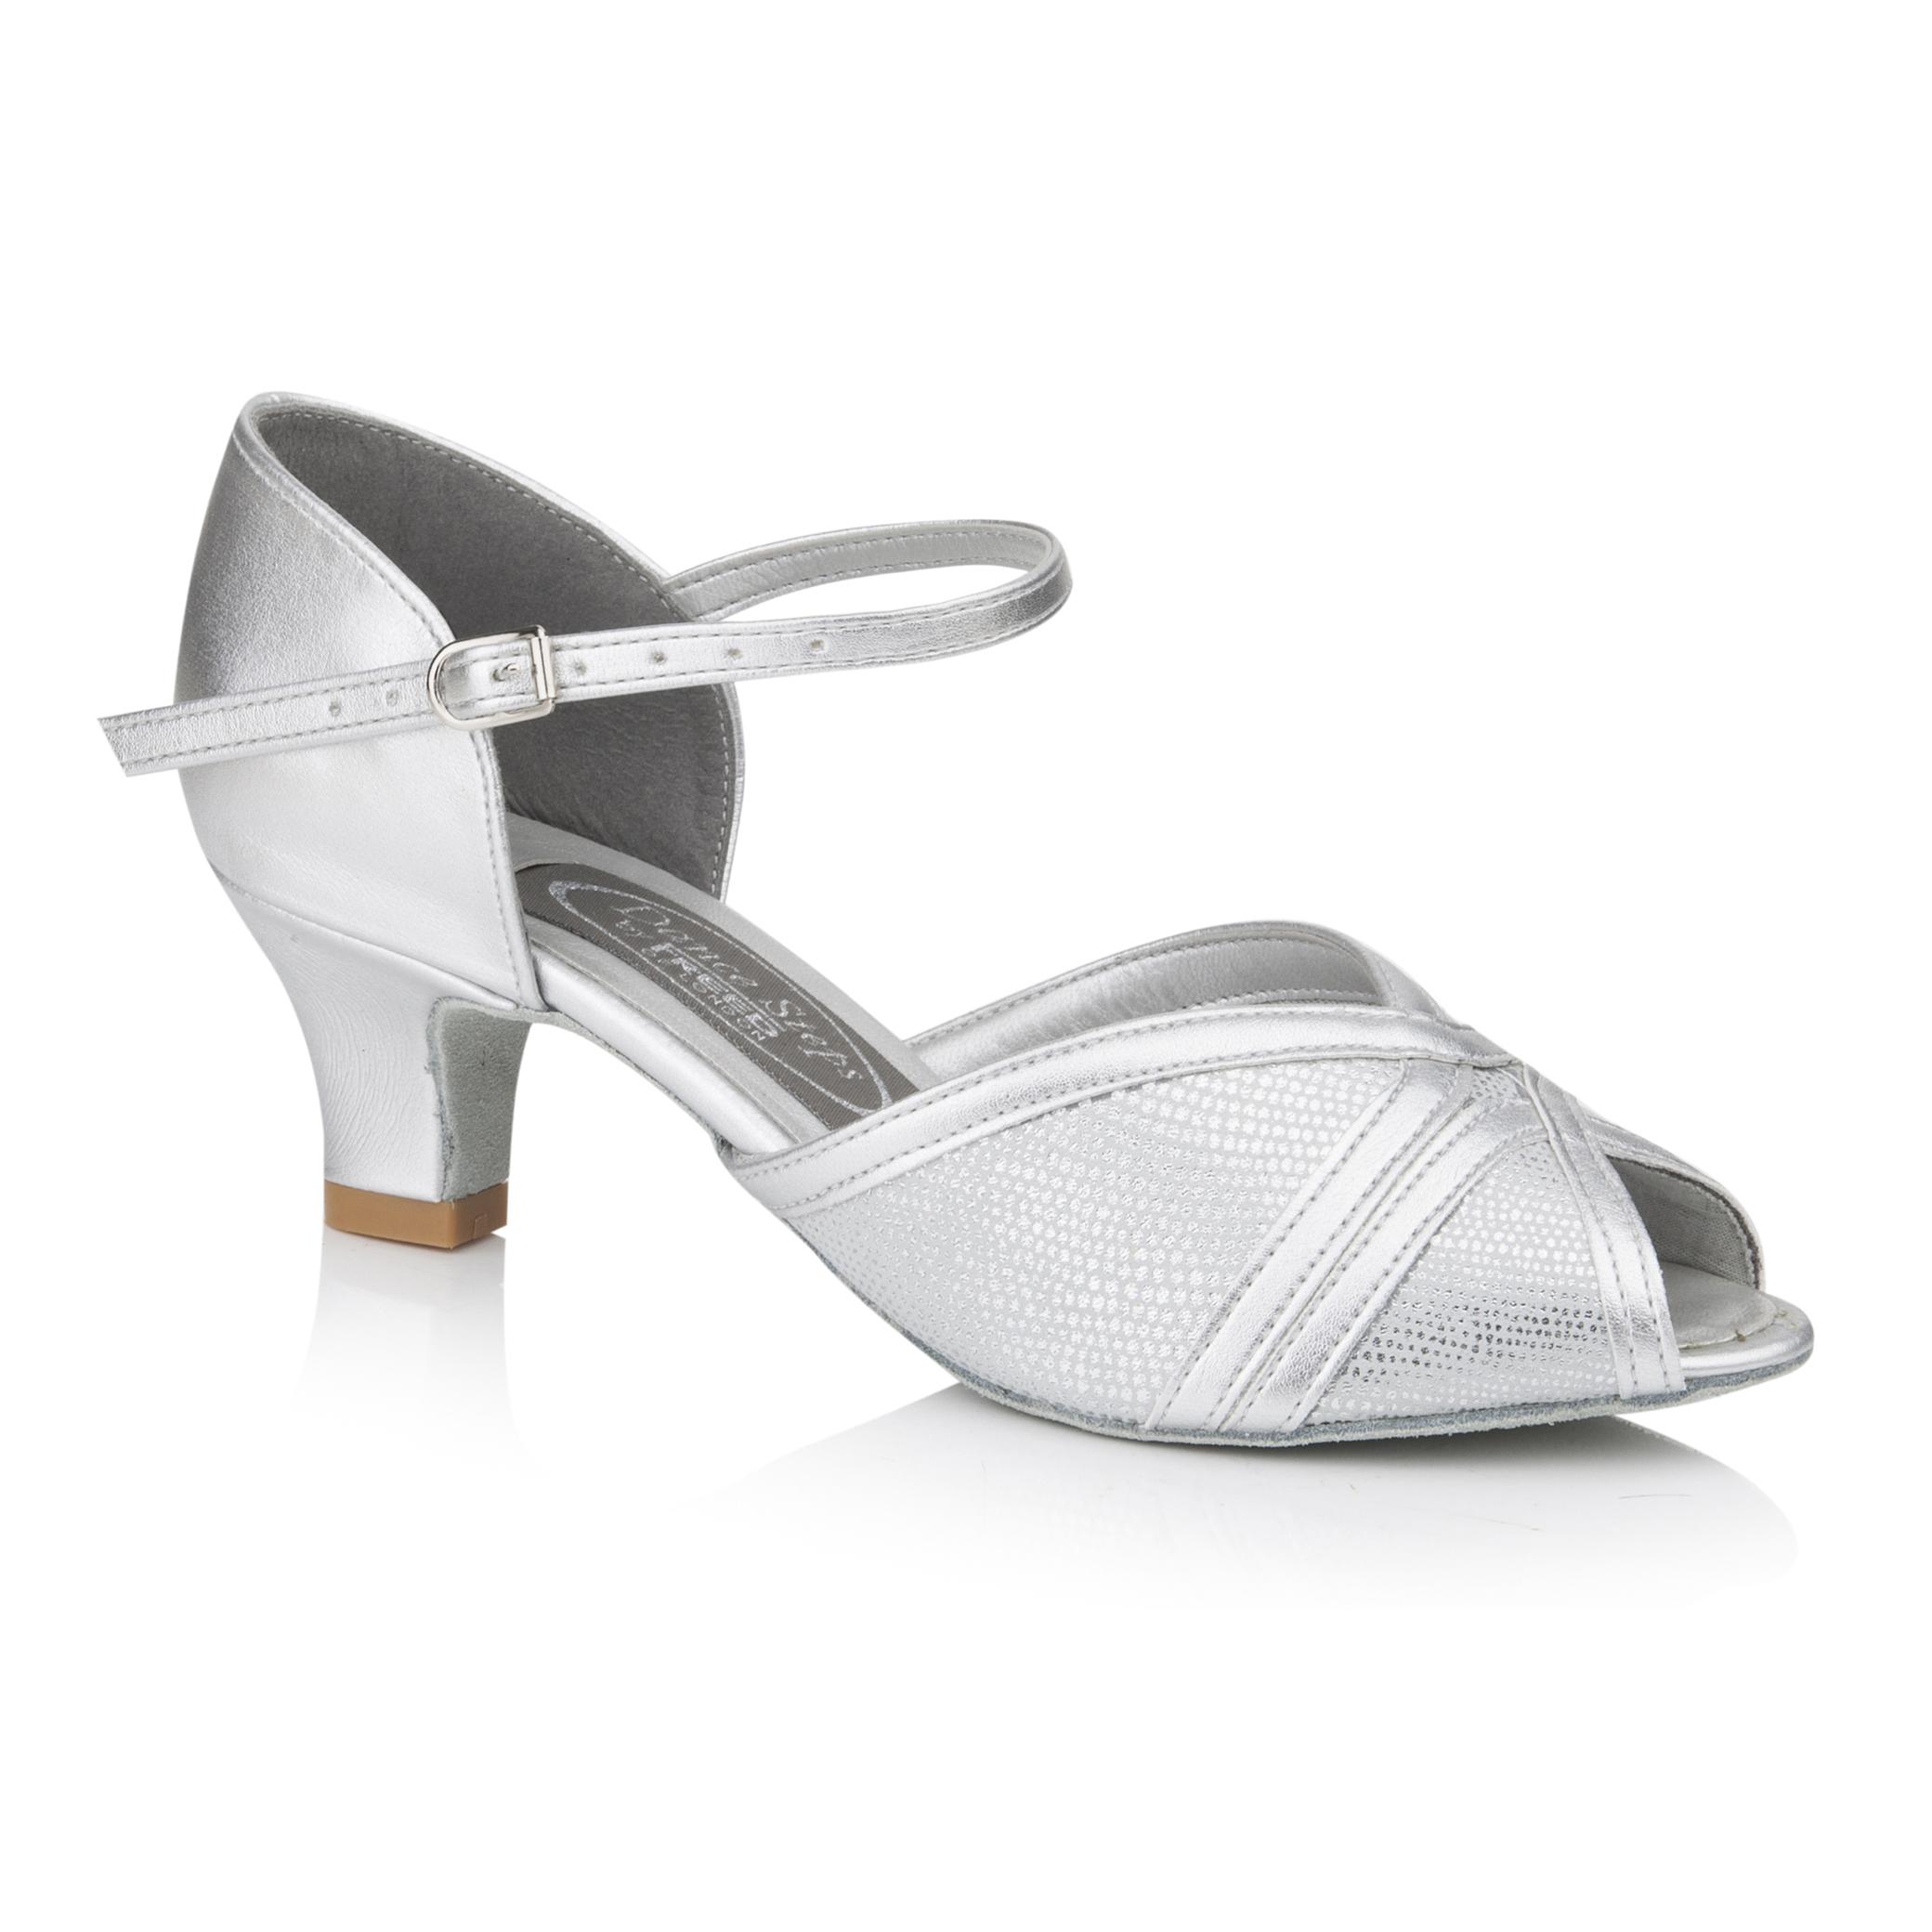 5eb9b859a Freed of London Amethyst Silver Dance Shoes 1 5/8″Heel